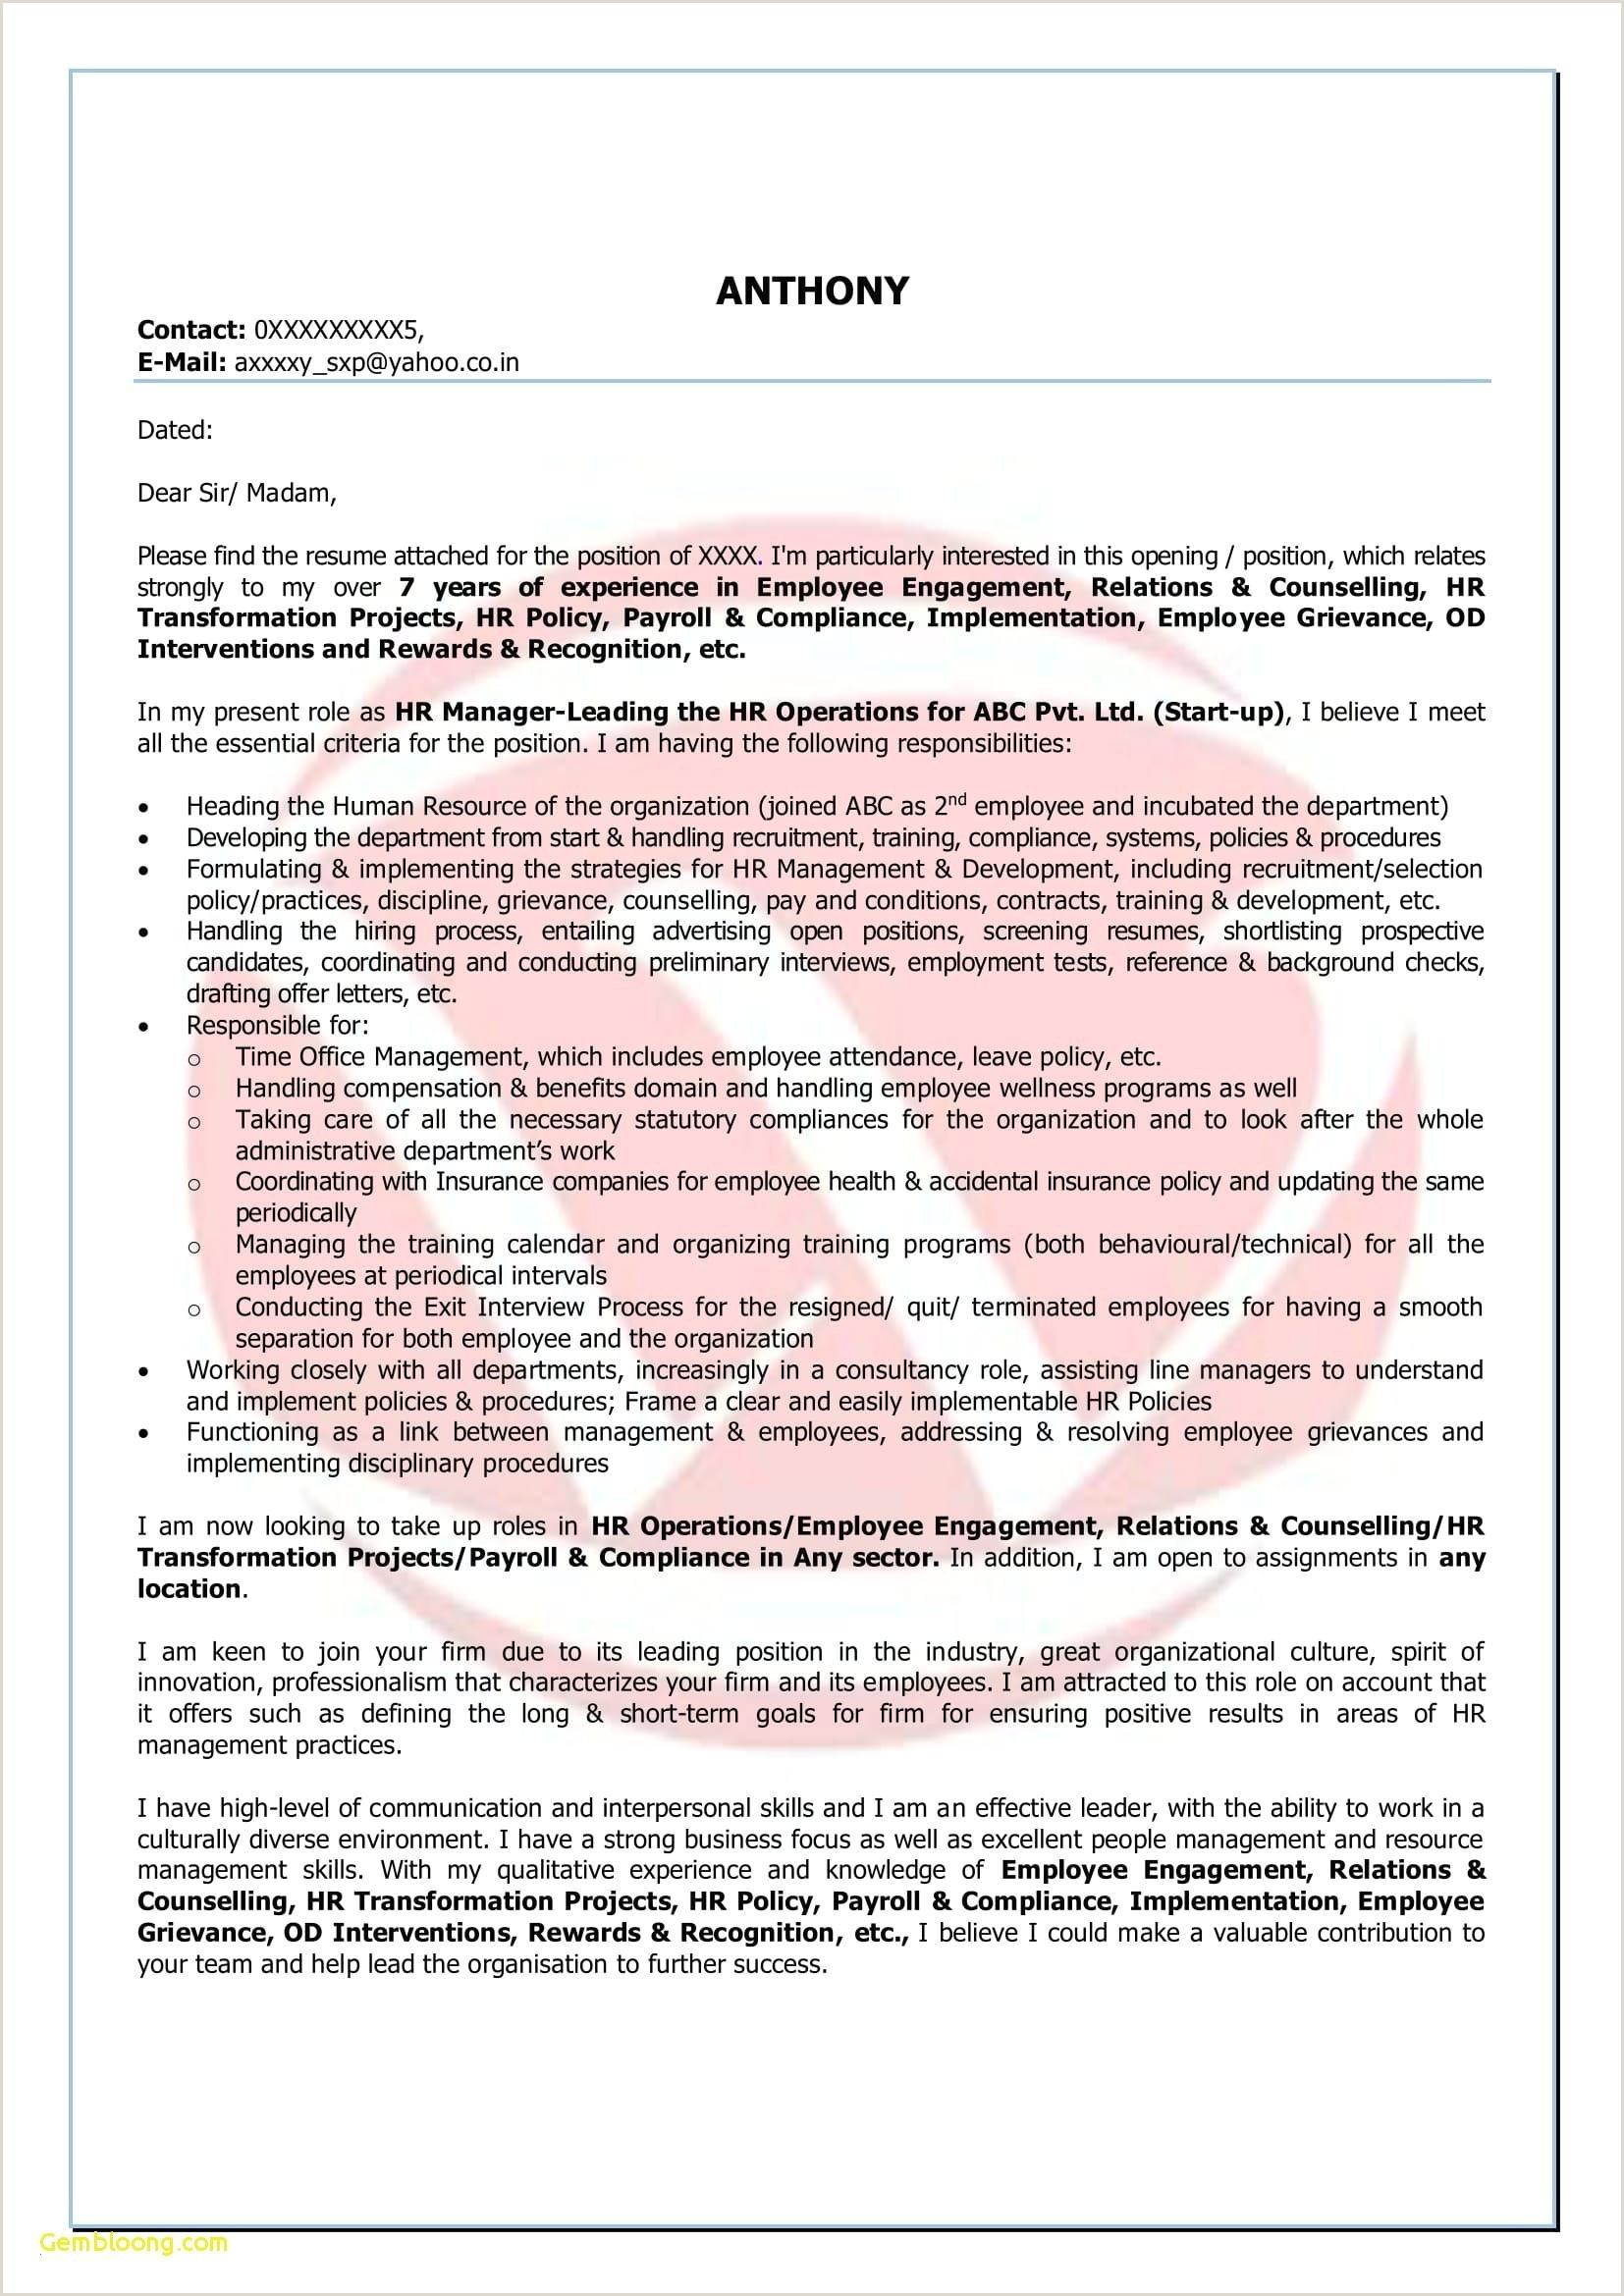 Lebenslauf Muster Google Docs Memorandum Trust for Lebenslauf In Englisch Muster Frisch